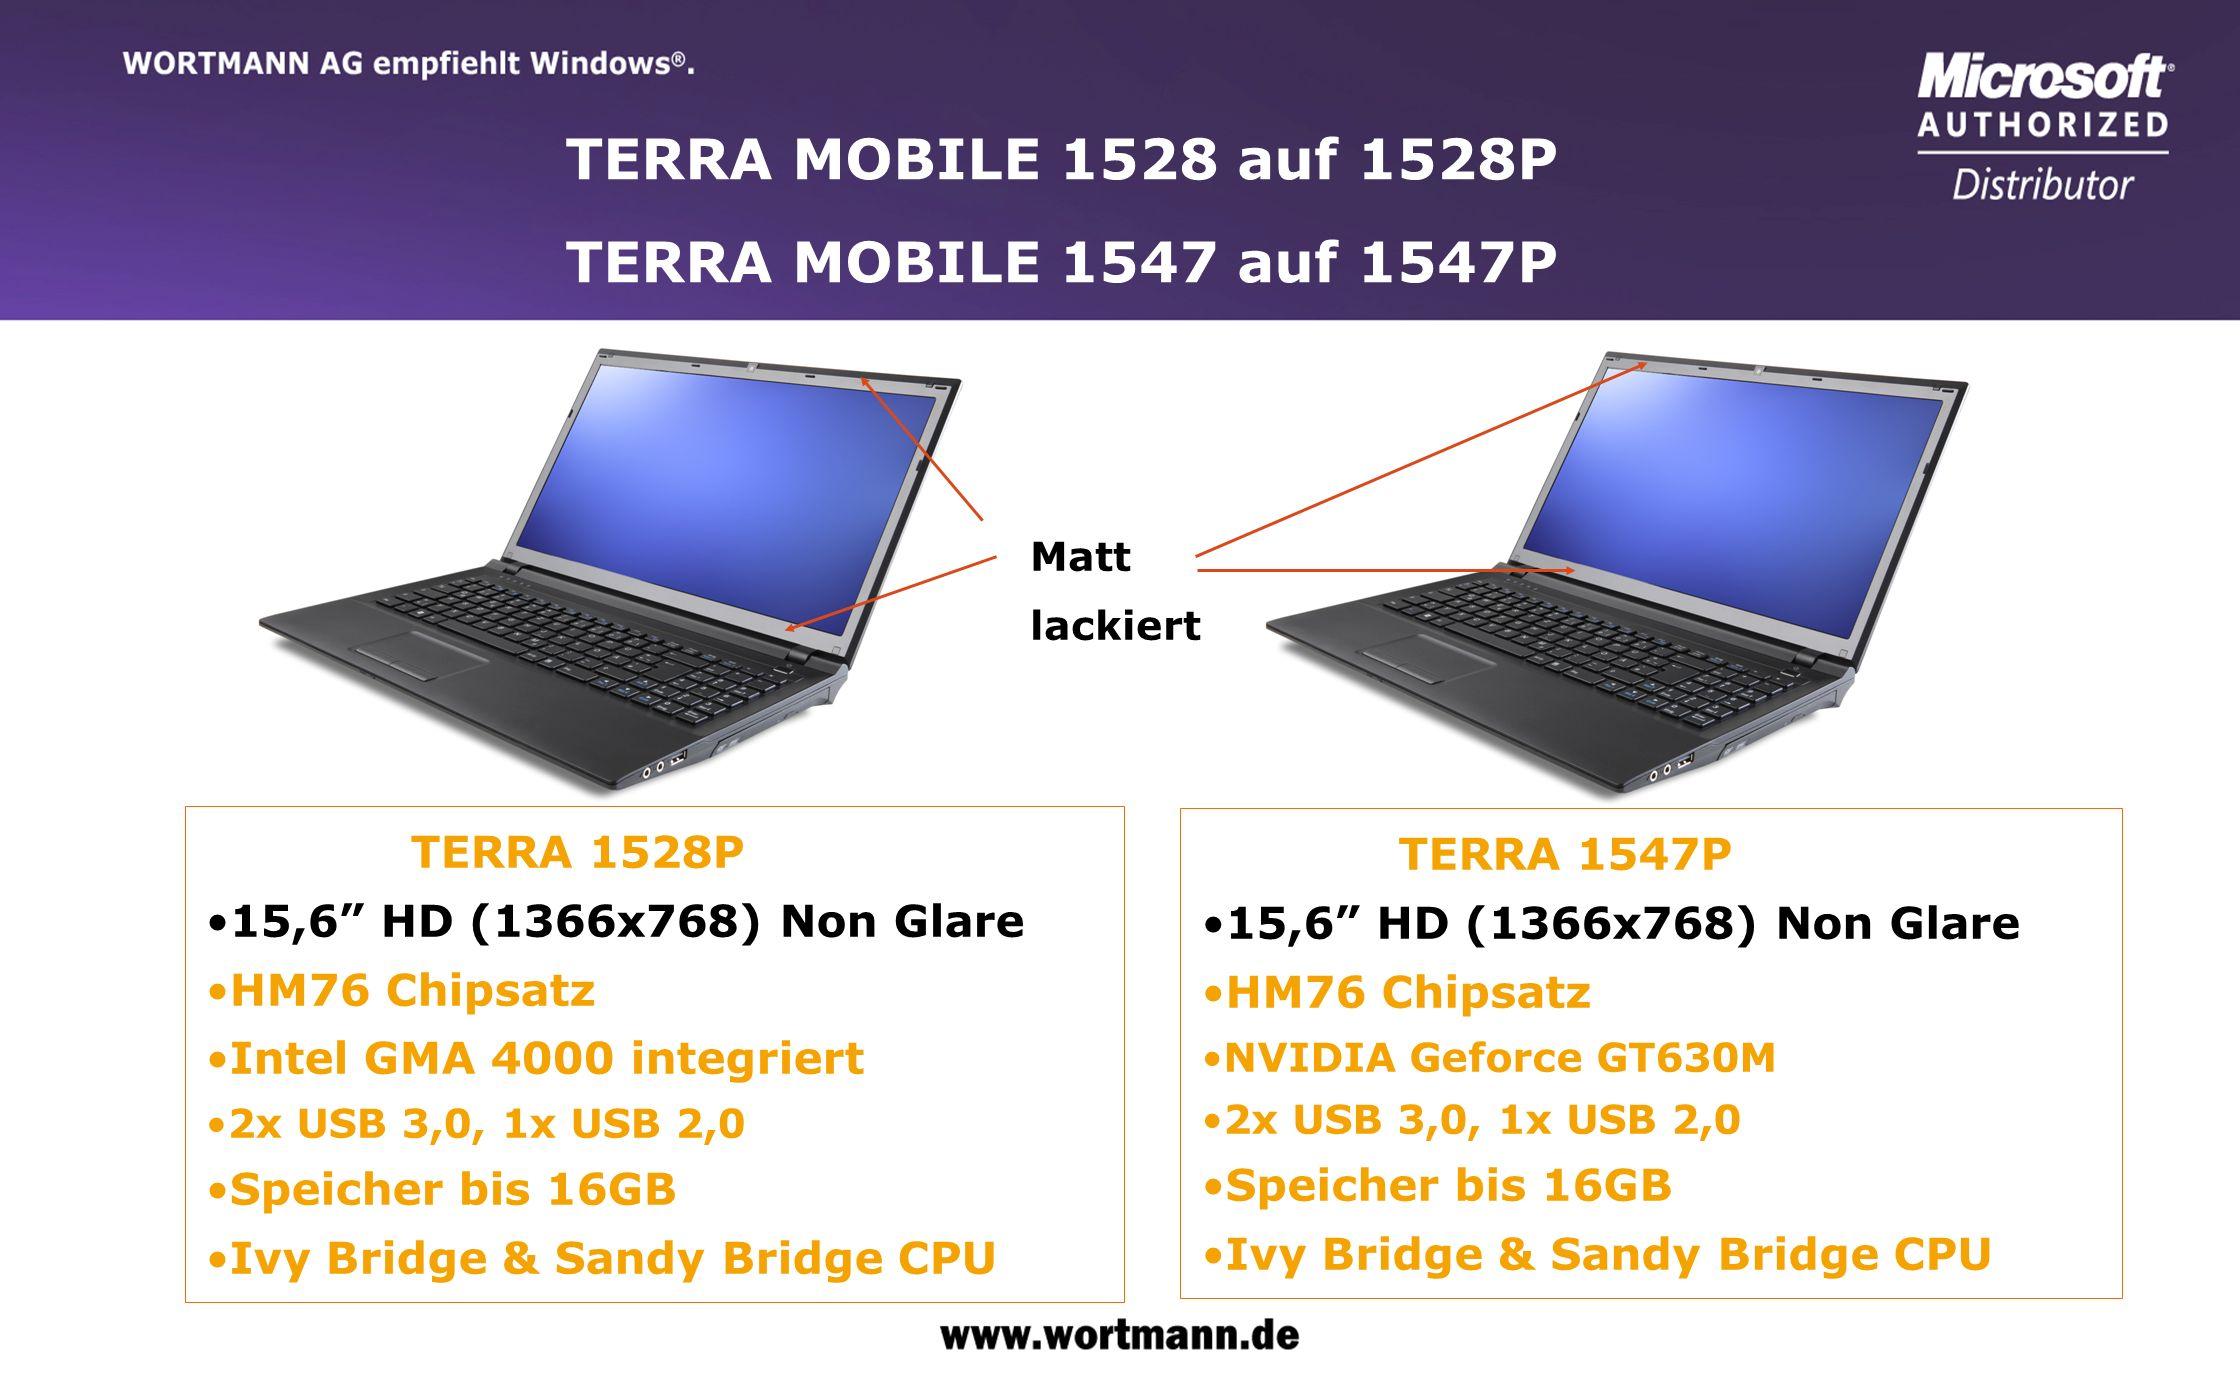 www.wortmann.de Eine Idee von Intel Ultrabook TM ULV BGA CPU Ultra slim display 3,6mm Alluminium- Deckel od.Gehäuse Ultra slim opt.LW 9,5mm SSD or Slim HDD Polymer Akku Höhe (Dicke): bis 13,3 Zoll:18 mm ab 14 Zoll:21 mm Convertibles:+2 mm CPU: 17W ULV (Core only) Akkulaufzeit: 5-8 Stunden